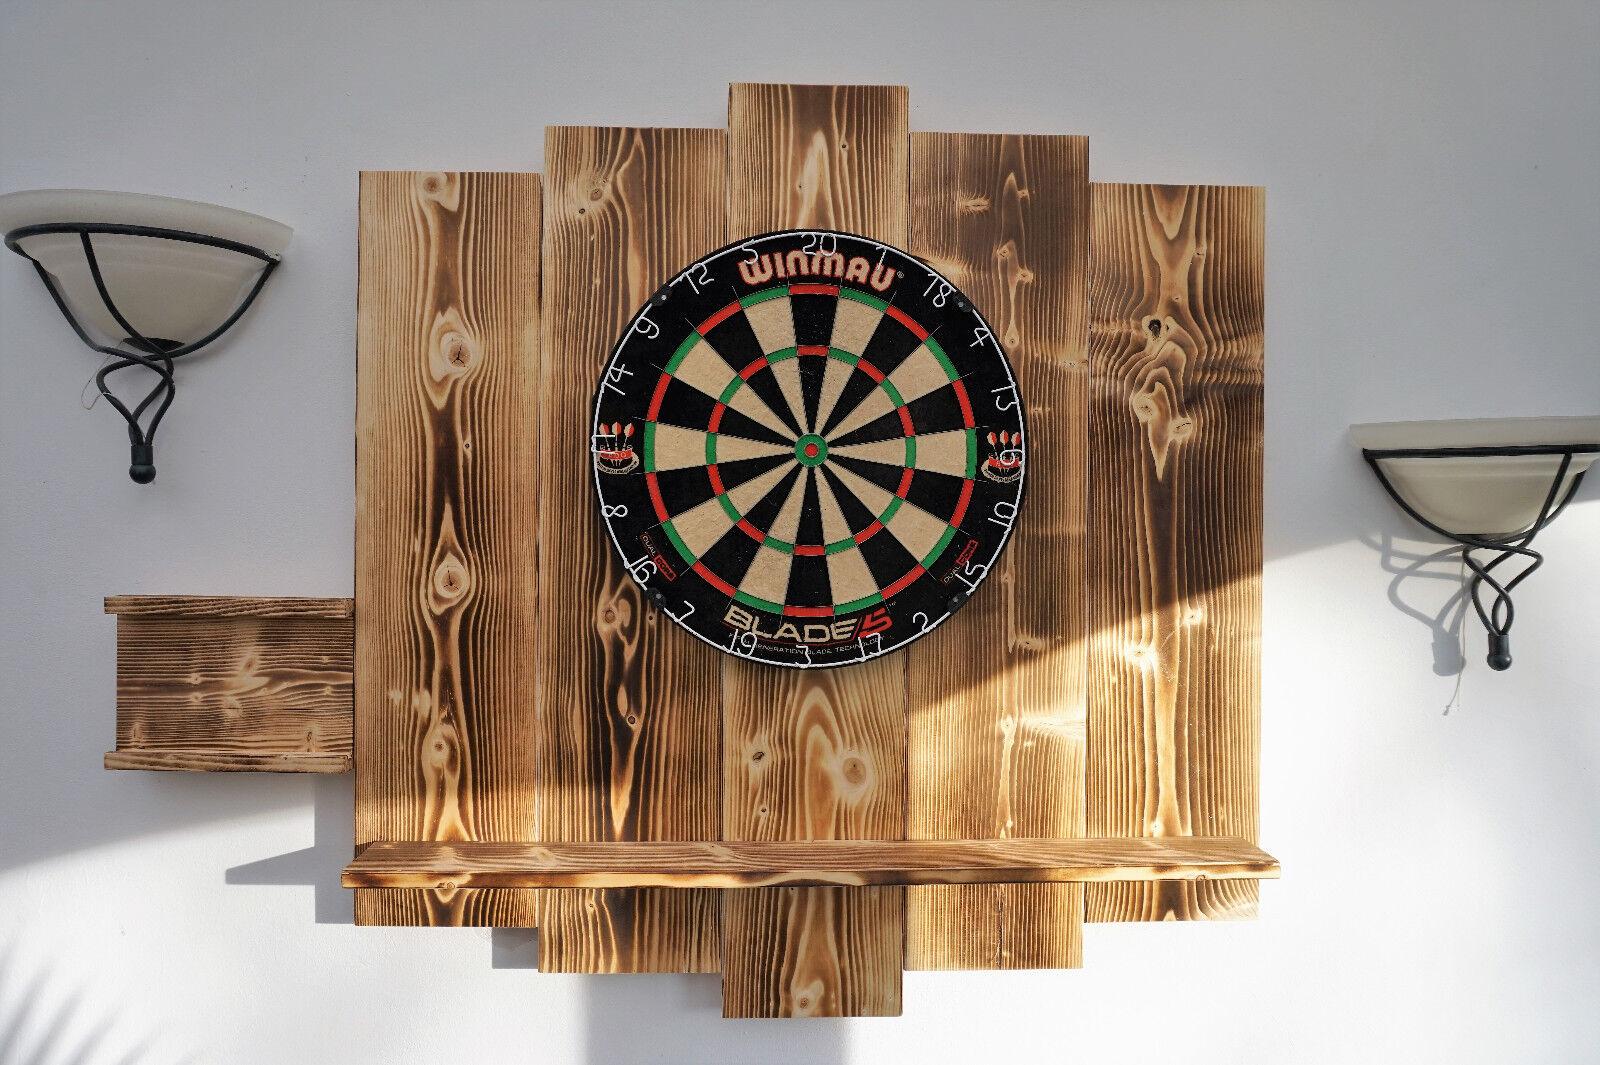 Dartboard-Wandschutz, Surround, Catchring, Ring Auffangring, Umrandung, Dart Ring Catchring, 3b8c6c